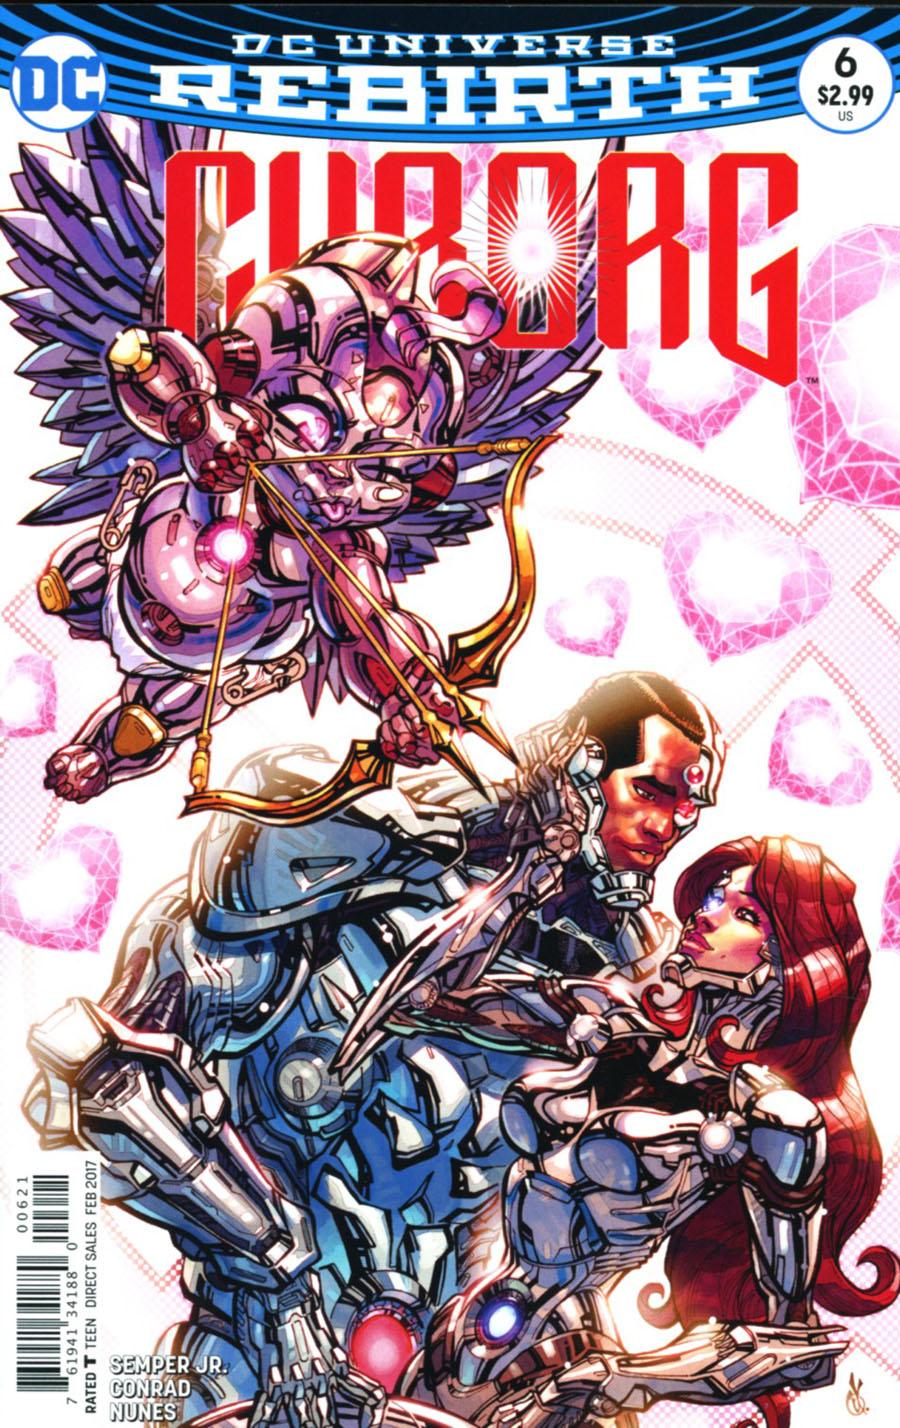 Cyborg Vol 2 #6 Cover B Variant Carlos DAnda Cover